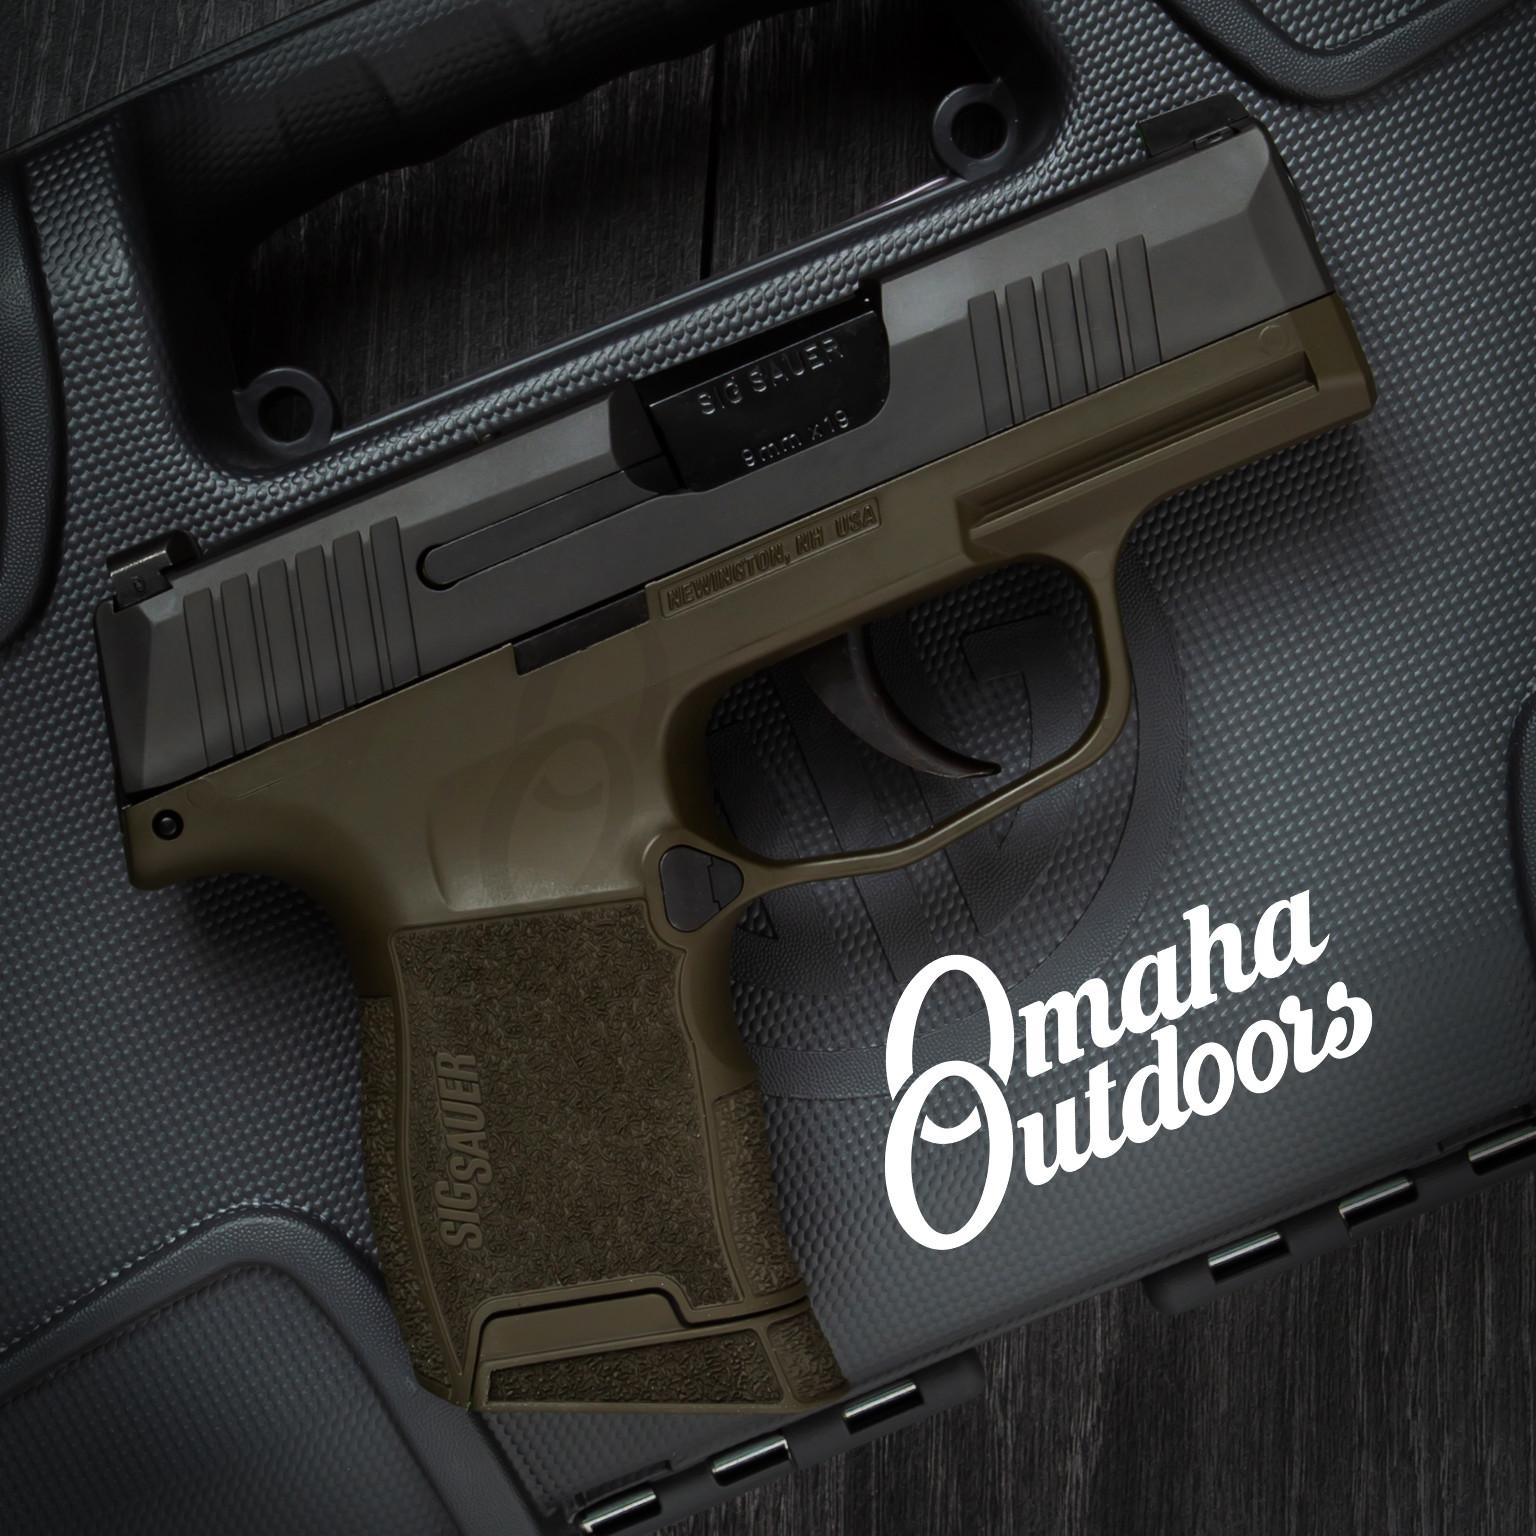 Sig Sauer P365 OD Green Pistol 9mm Black Slide 10 RD XRay3 Day / Night  Sights 365-9-BXR3-MODG-FR